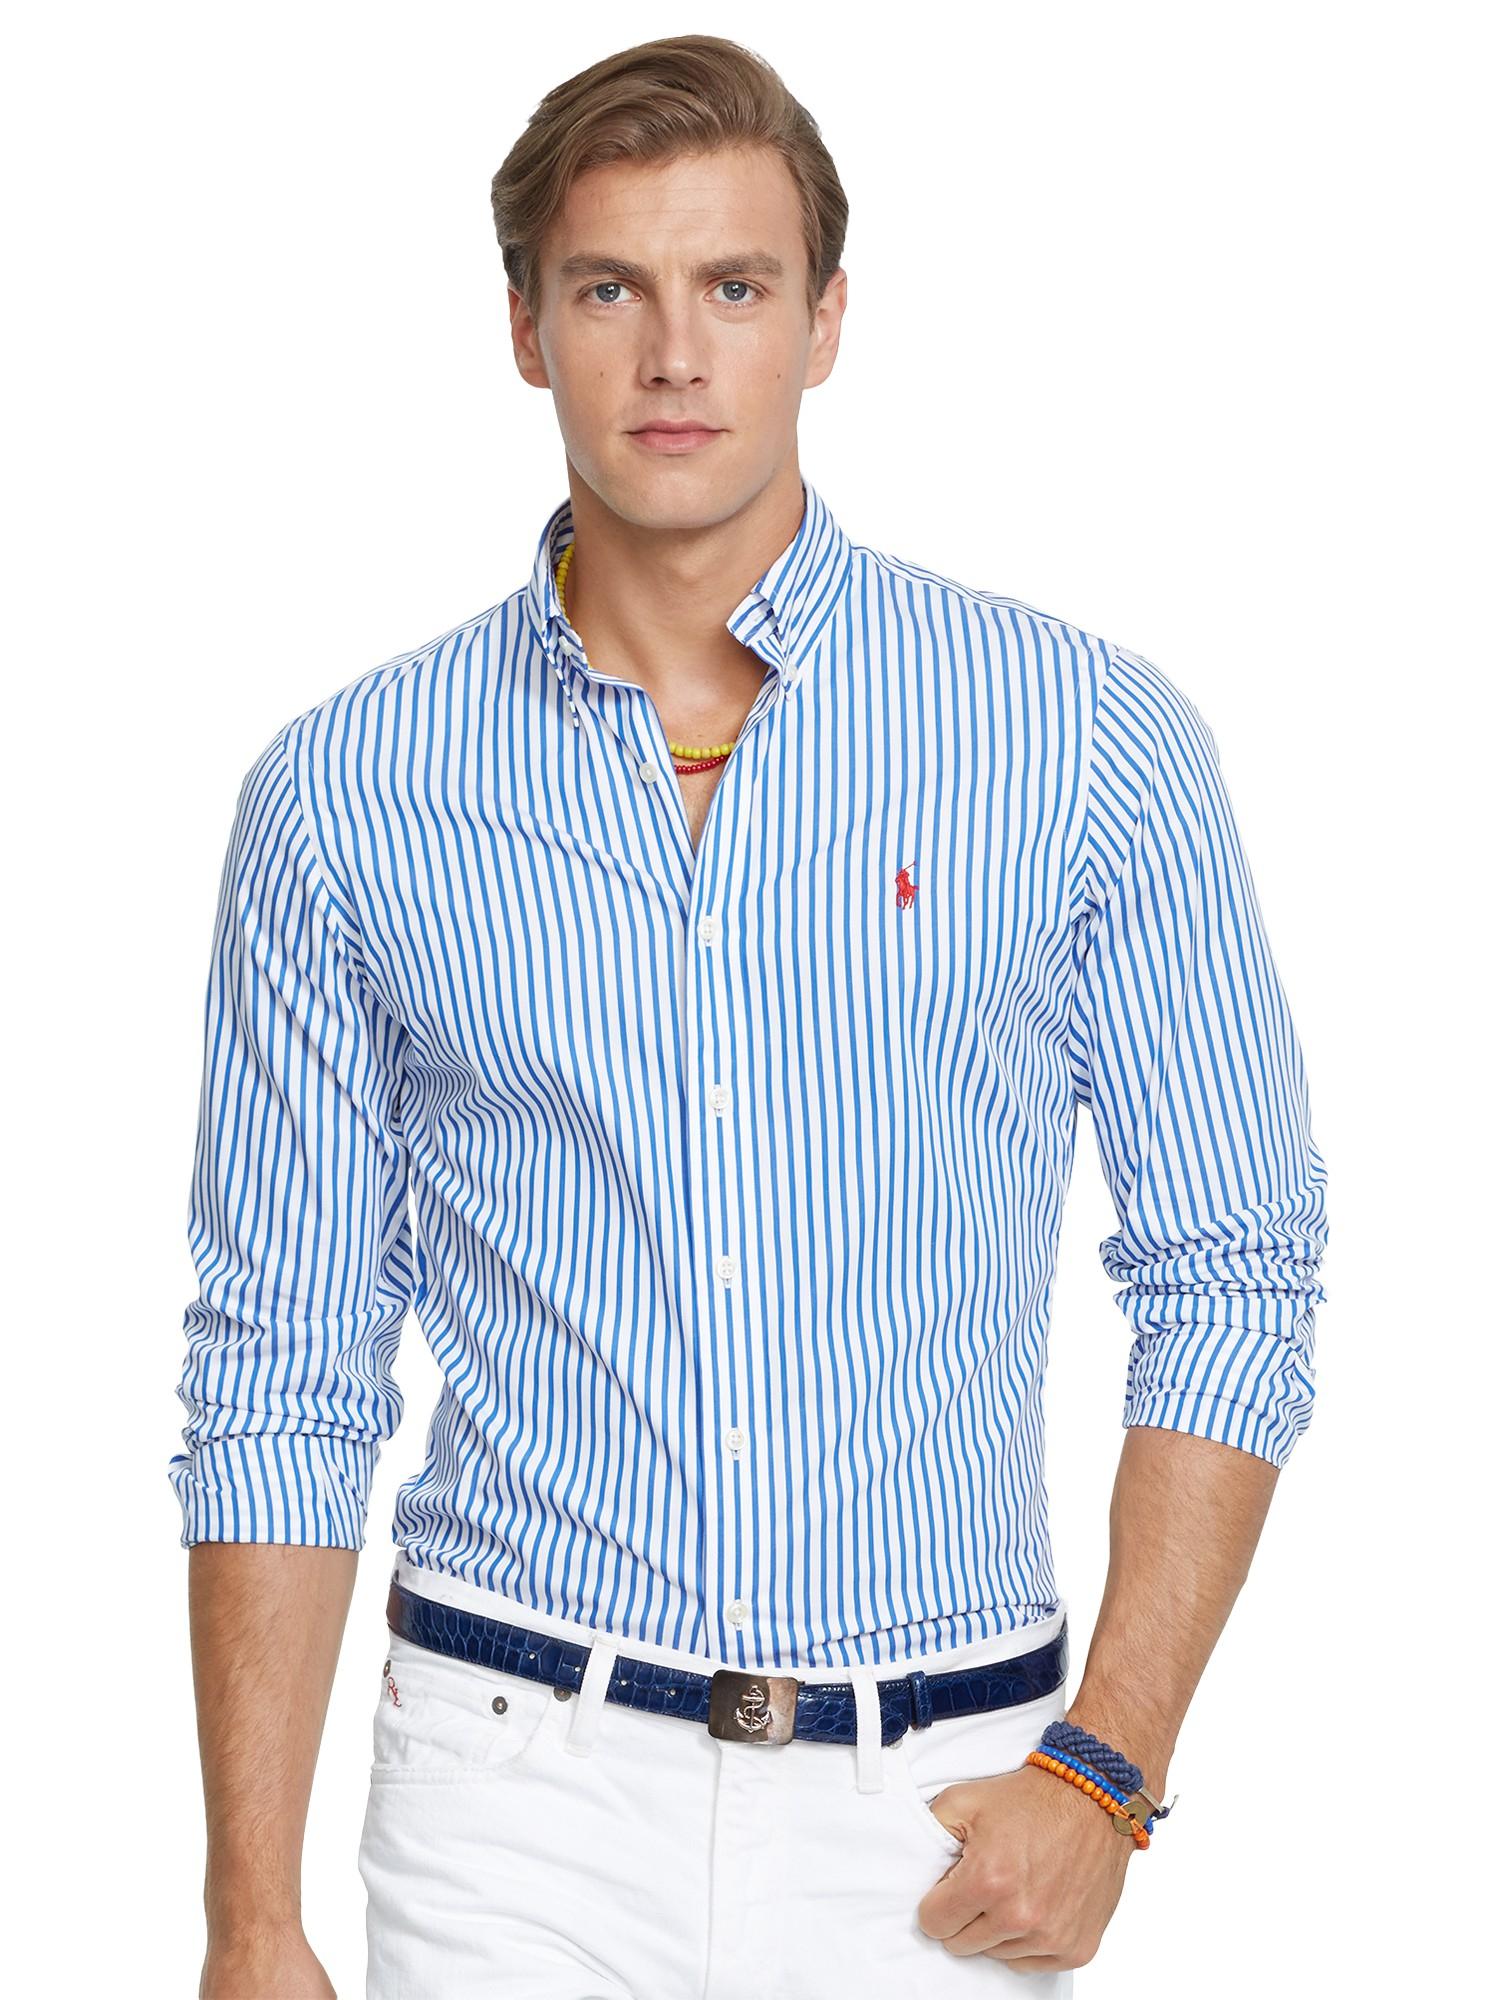 31338c9cf9 Polo Ralph Lauren Bengal Stripe Poplin Shirt in Blue for Men - Lyst